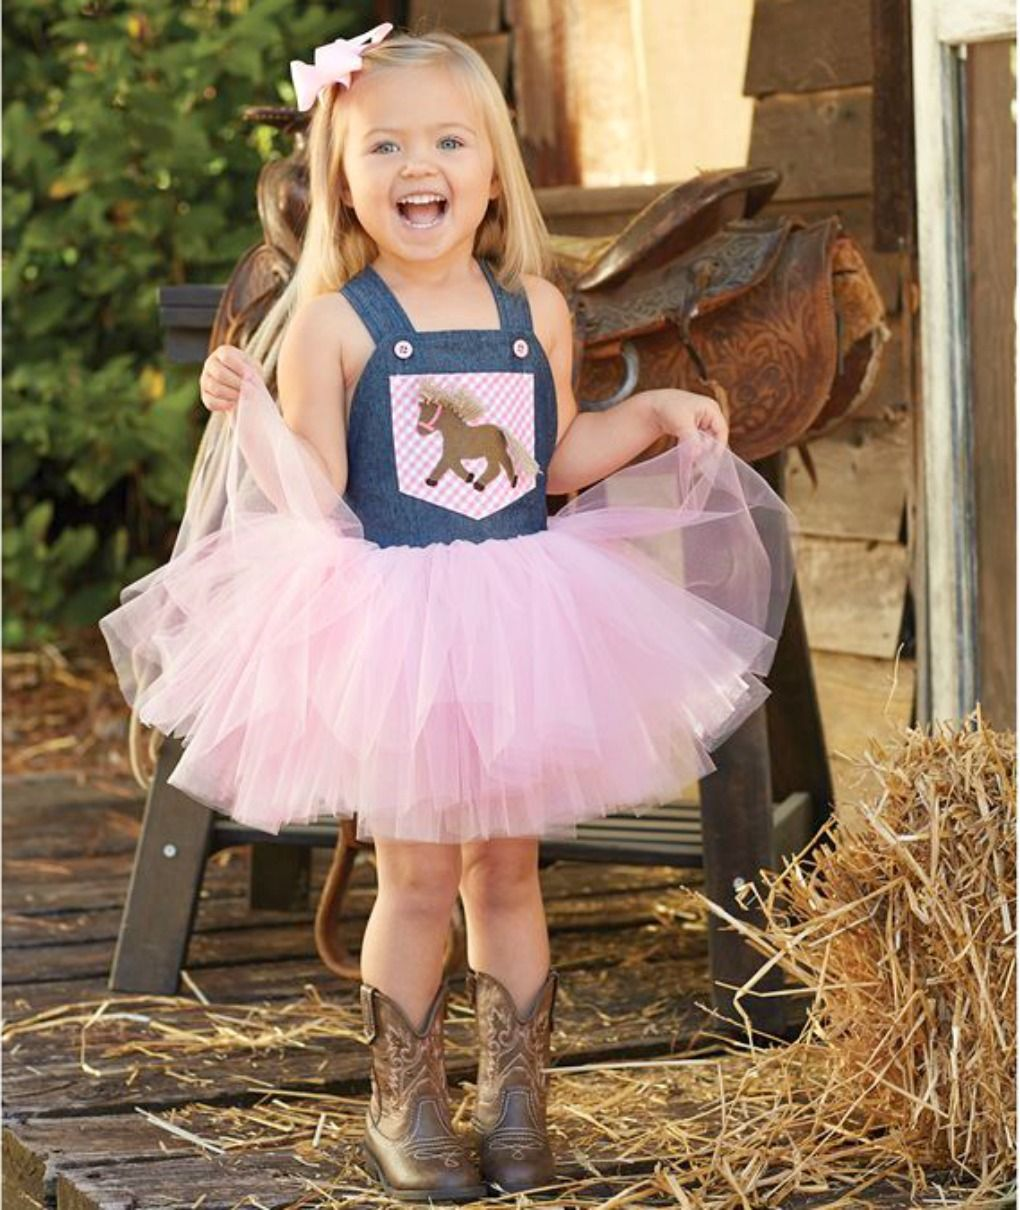 Mud Pie Little Girls 2 Pc Set : Overall Tutu Dress and Headband Bow ...